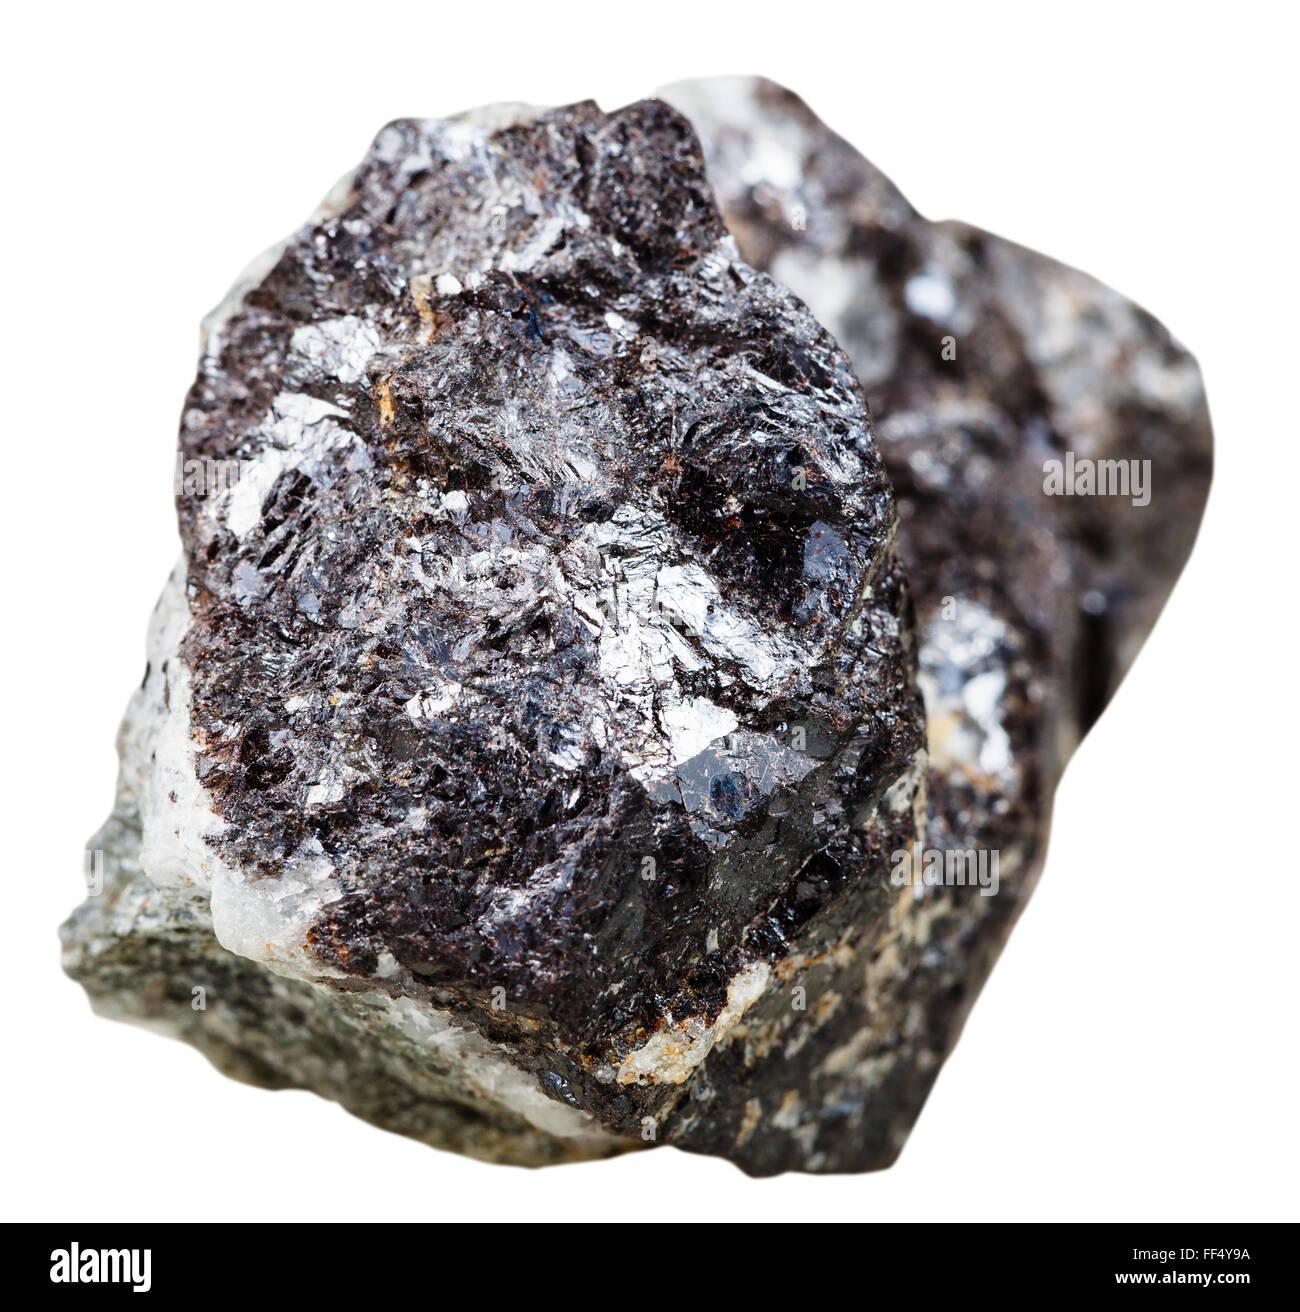 macro shooting of natural mineral stone - sphalerite (zinc blende) stone isolated on white background - Stock Image